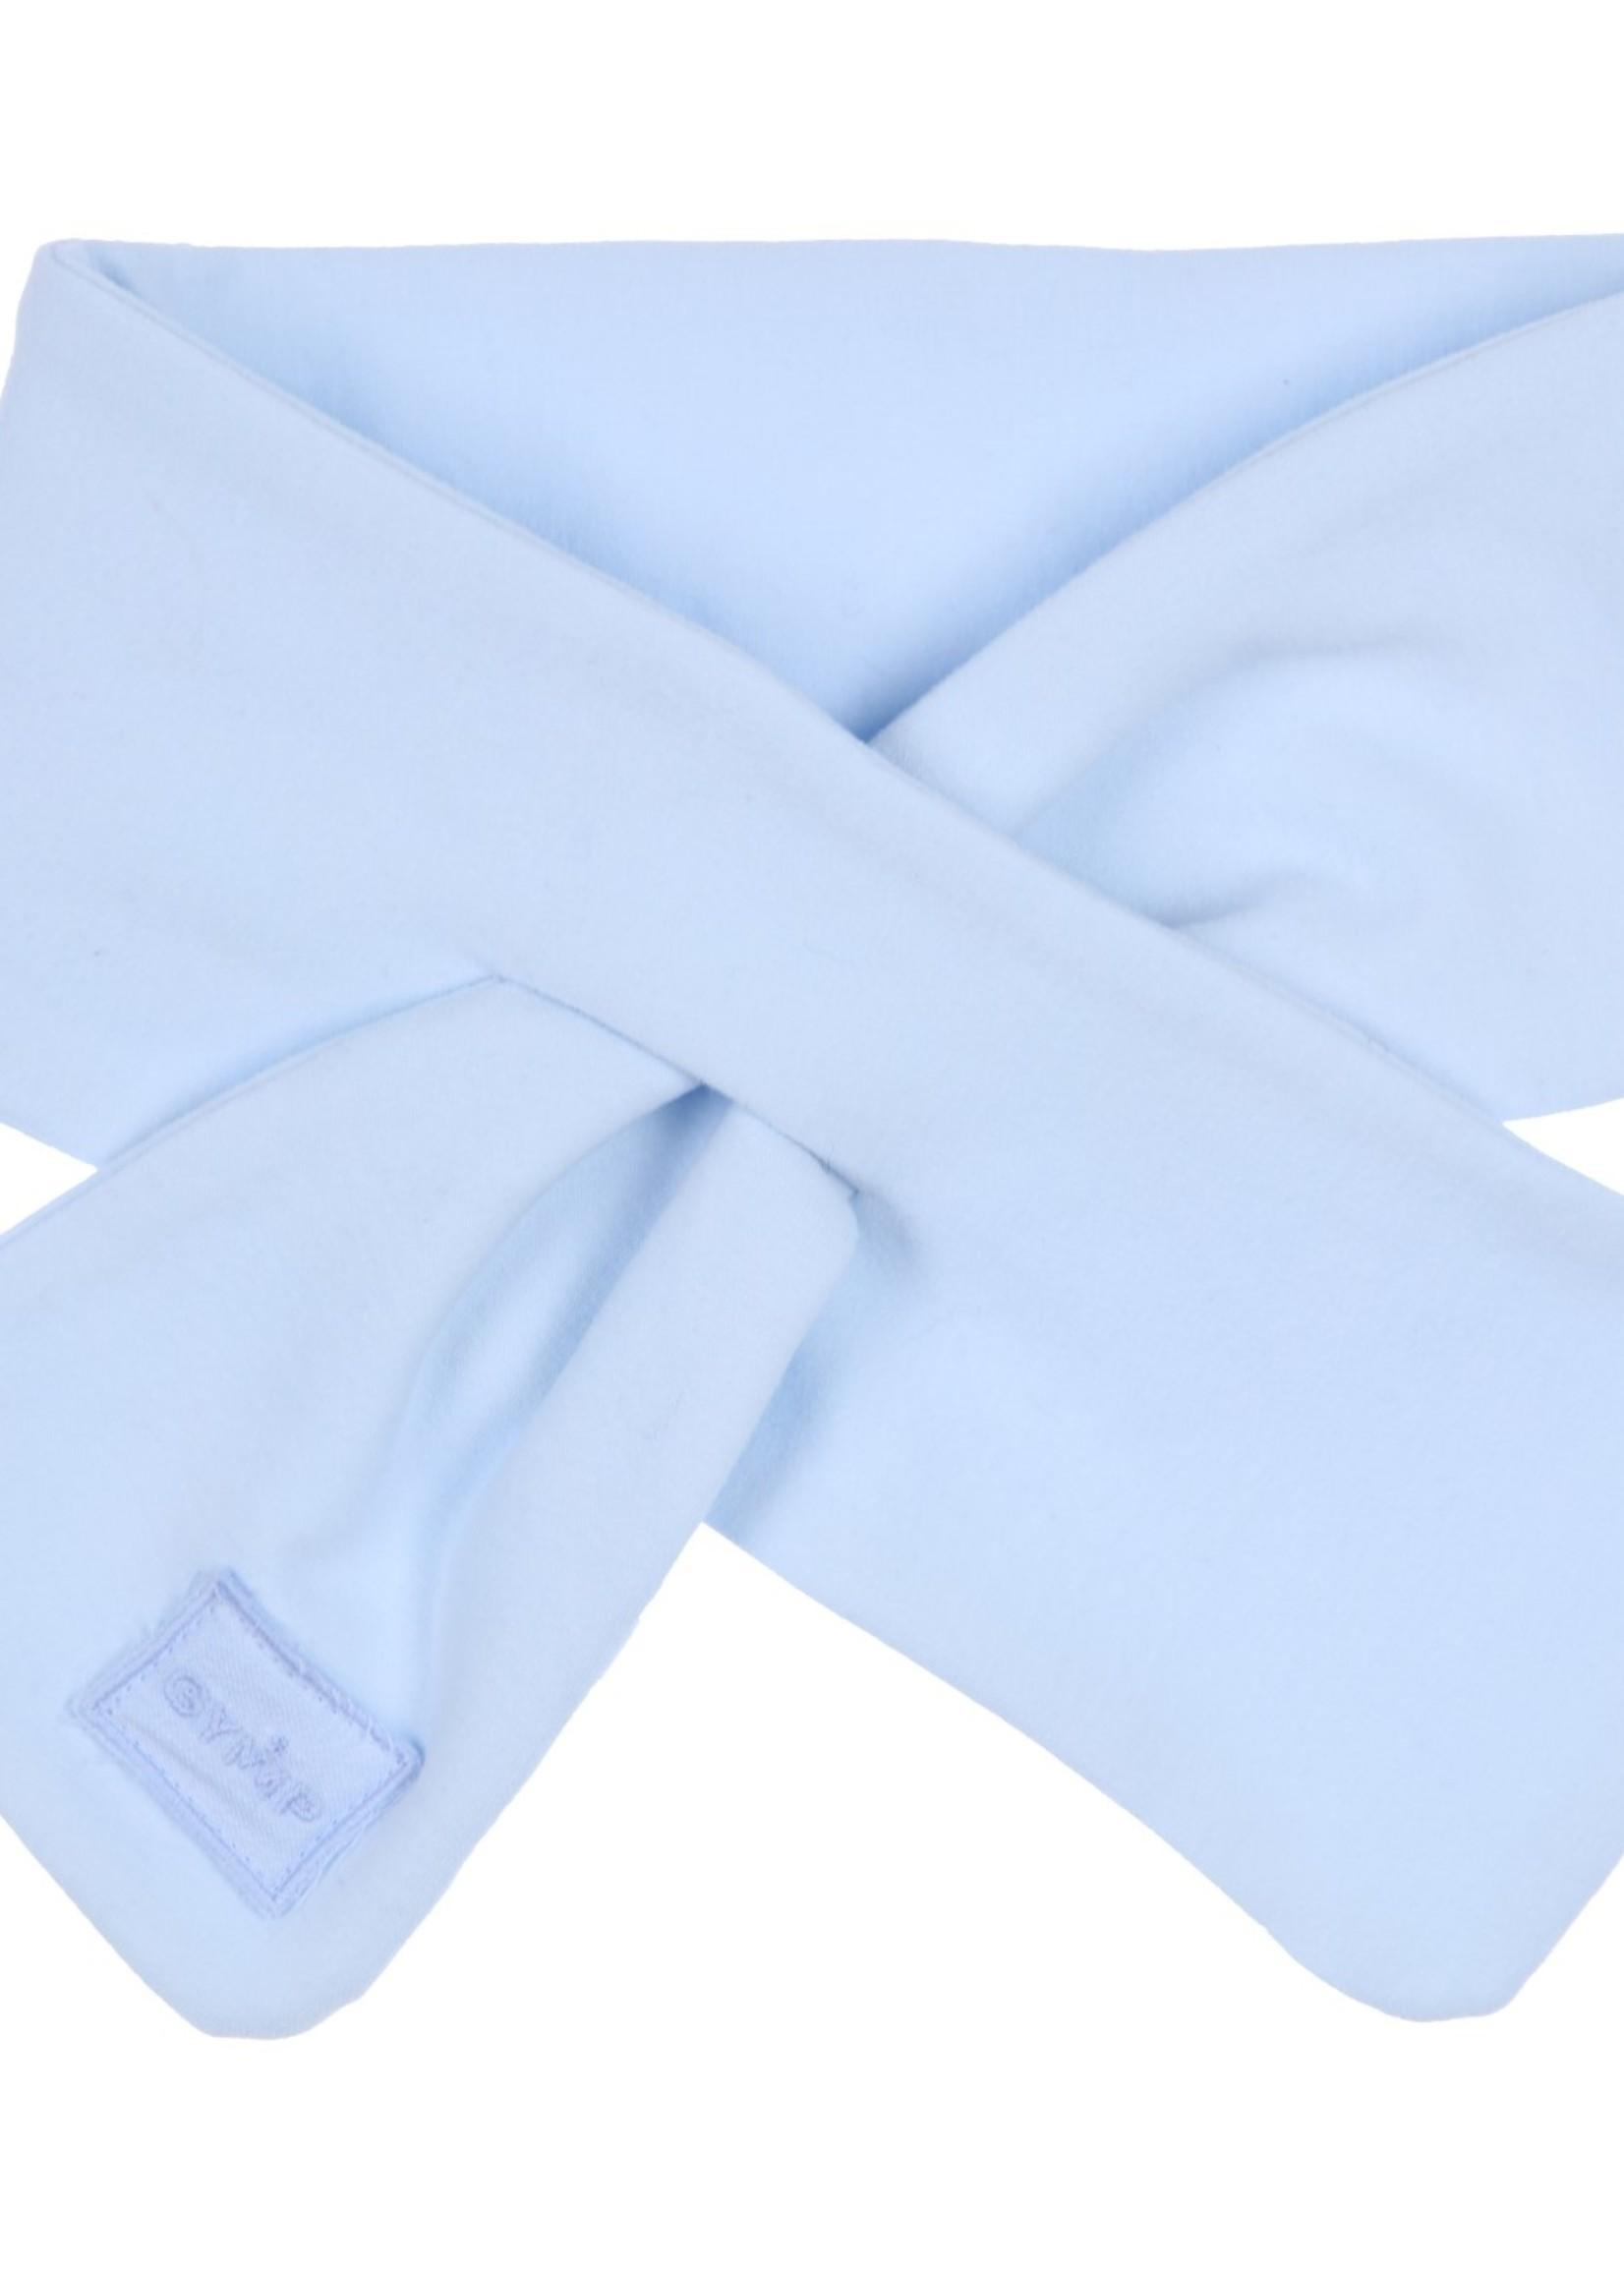 Gymp Gymp boys shawl CARBONDOUX  blauw